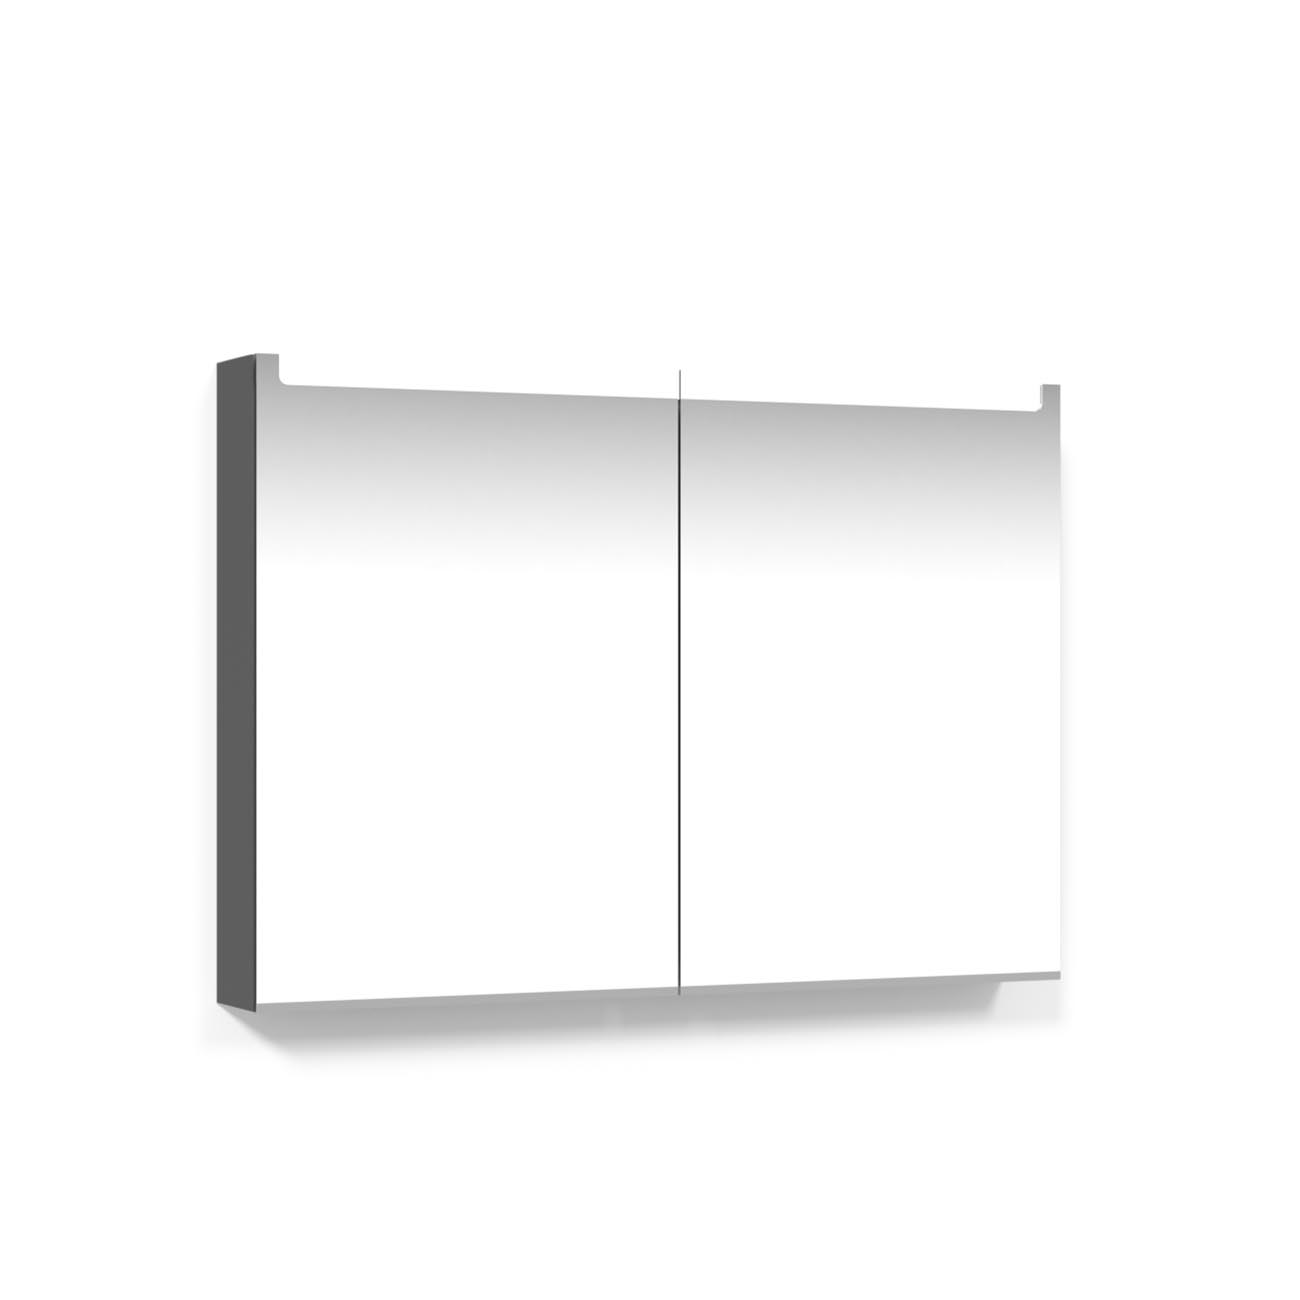 Spegelskåp Macro Design 1000 Infälld LED